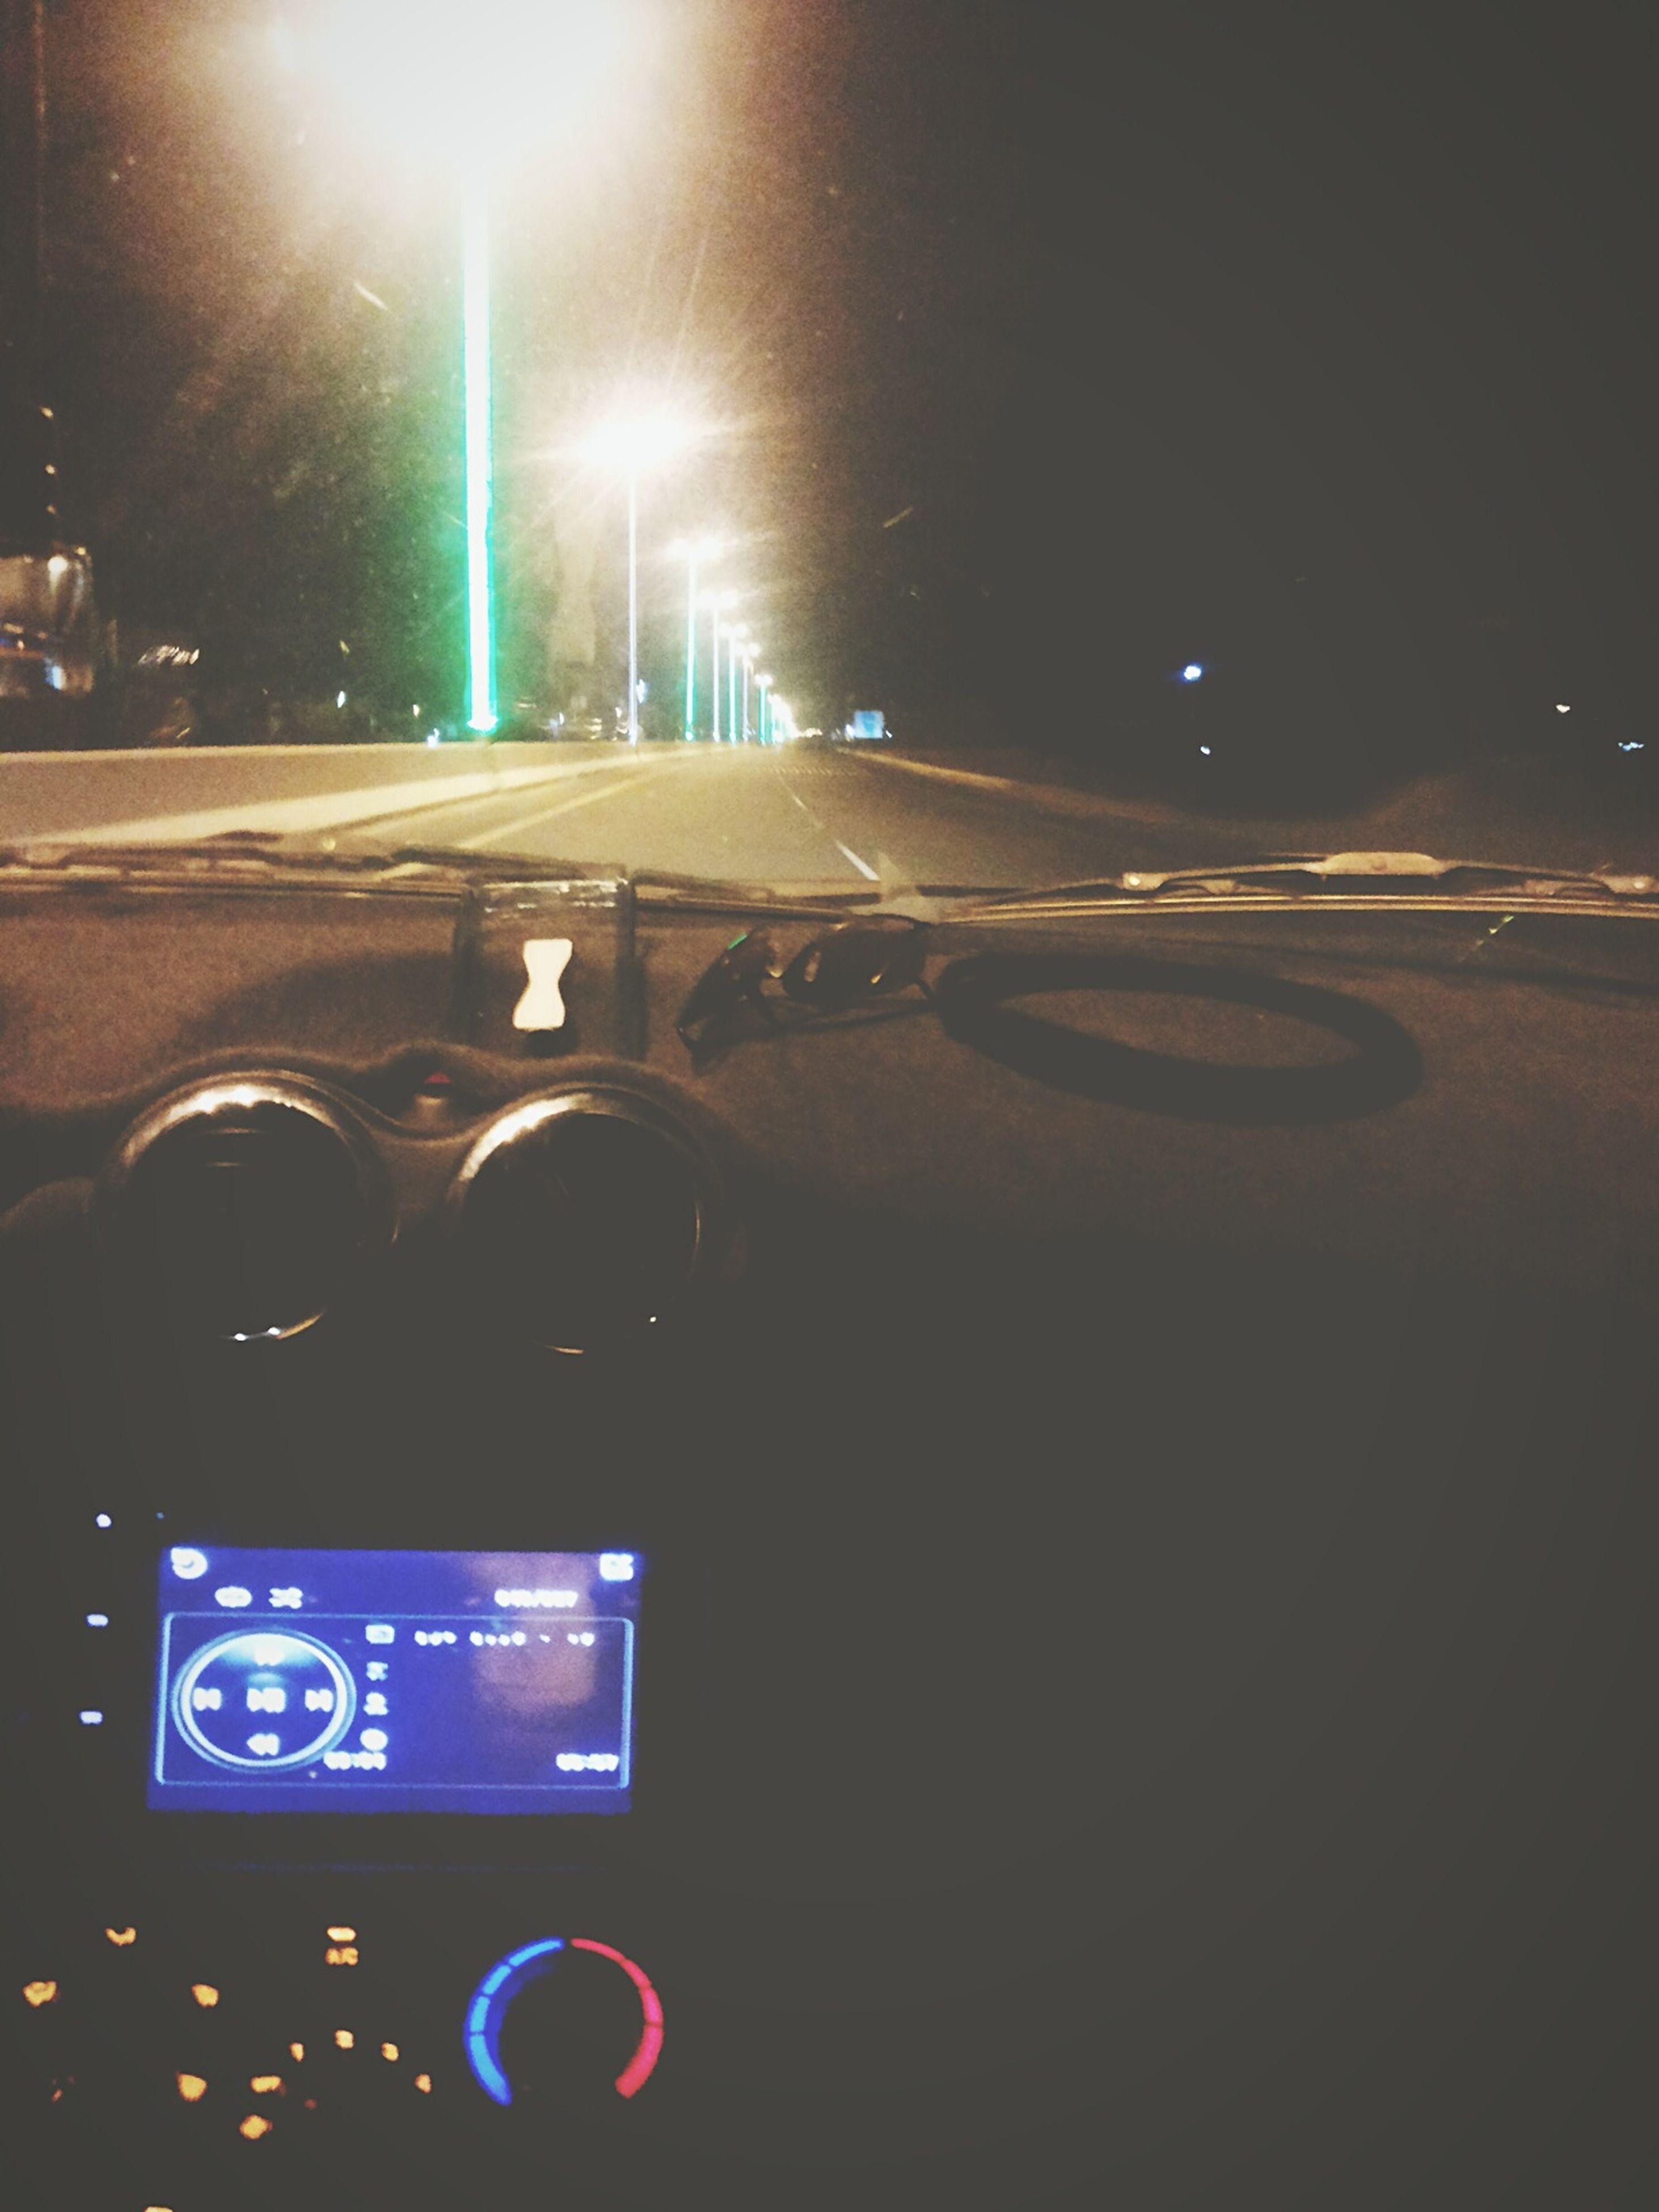 transportation, illuminated, night, car, land vehicle, mode of transport, road, street, traffic, street light, communication, on the move, lighting equipment, guidance, road marking, road sign, text, city street, headlight, speed